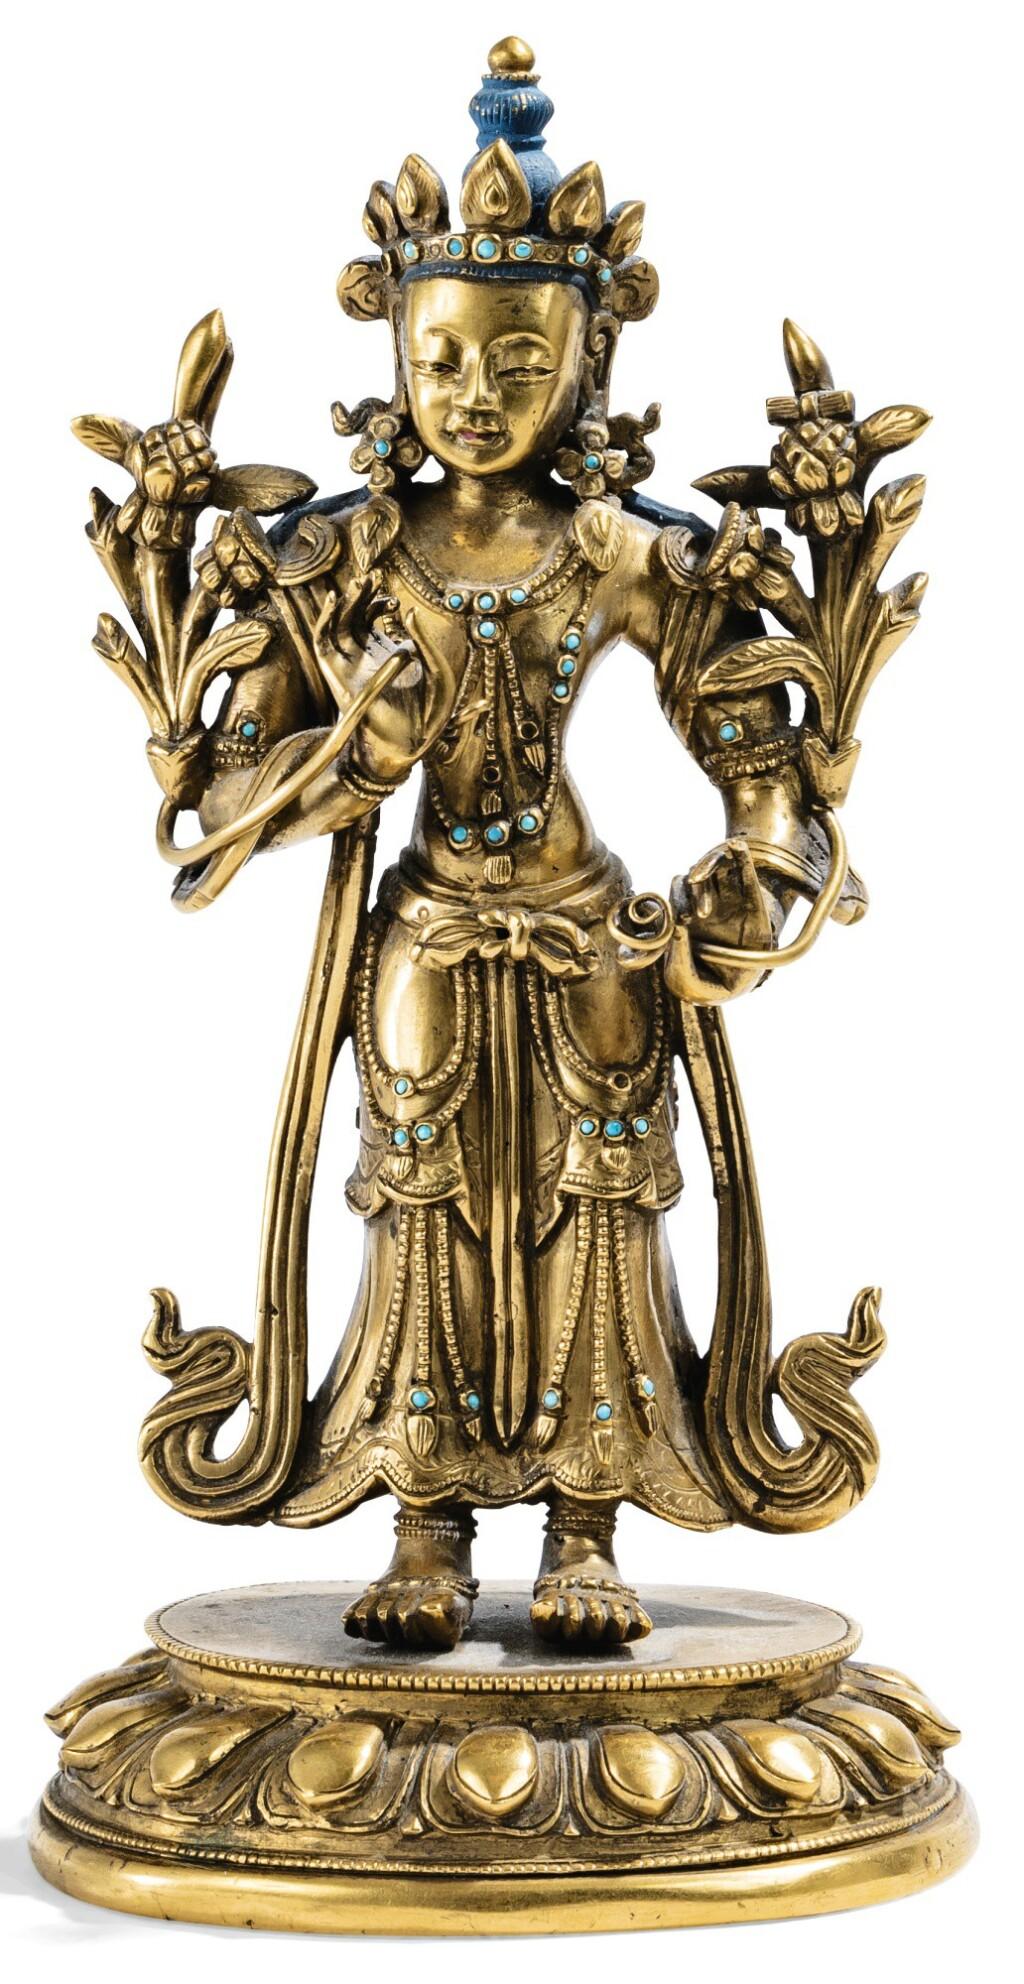 STATUETTE D'AVALOKITESHVARA EN BRONZE DORÉ DYNASTIE QING, XIXE SIÈCLE | 清十九世紀 鎏金銅觀世音菩薩立像 | A gilt-bronze figure of Avalokiteshvara, Qing Dynasty, 19th century